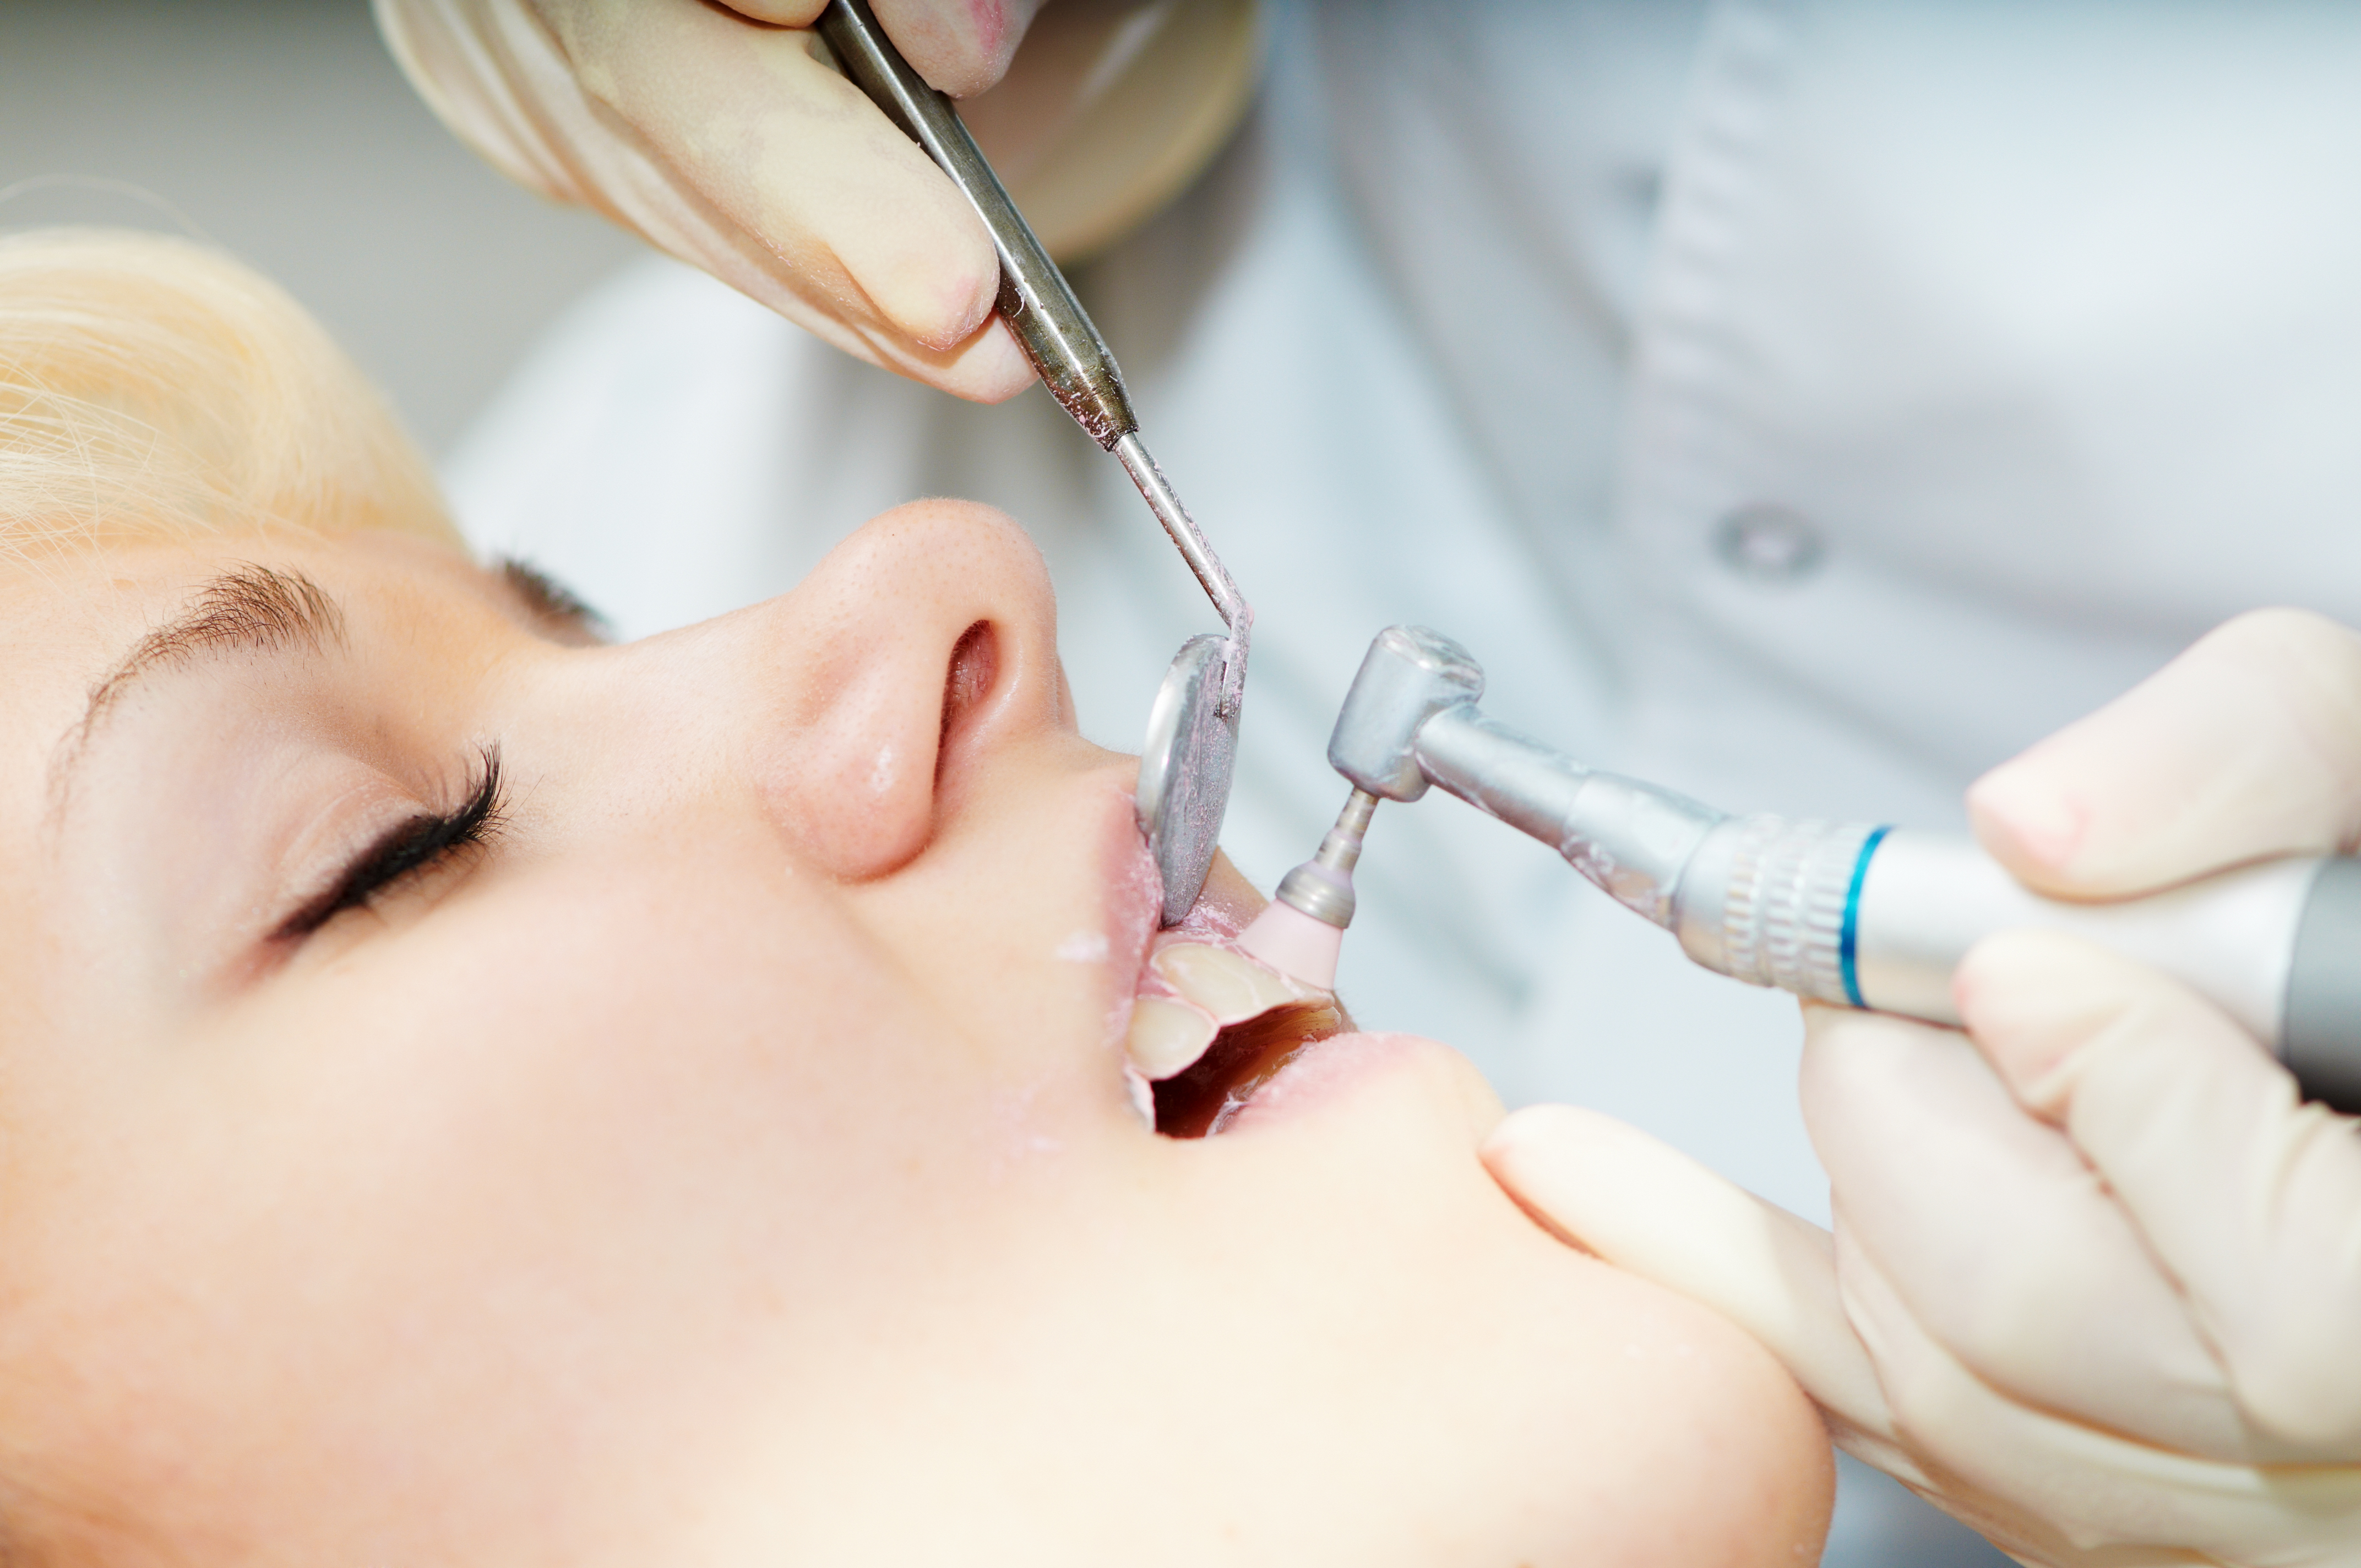 Extracción dental en Majadahonda